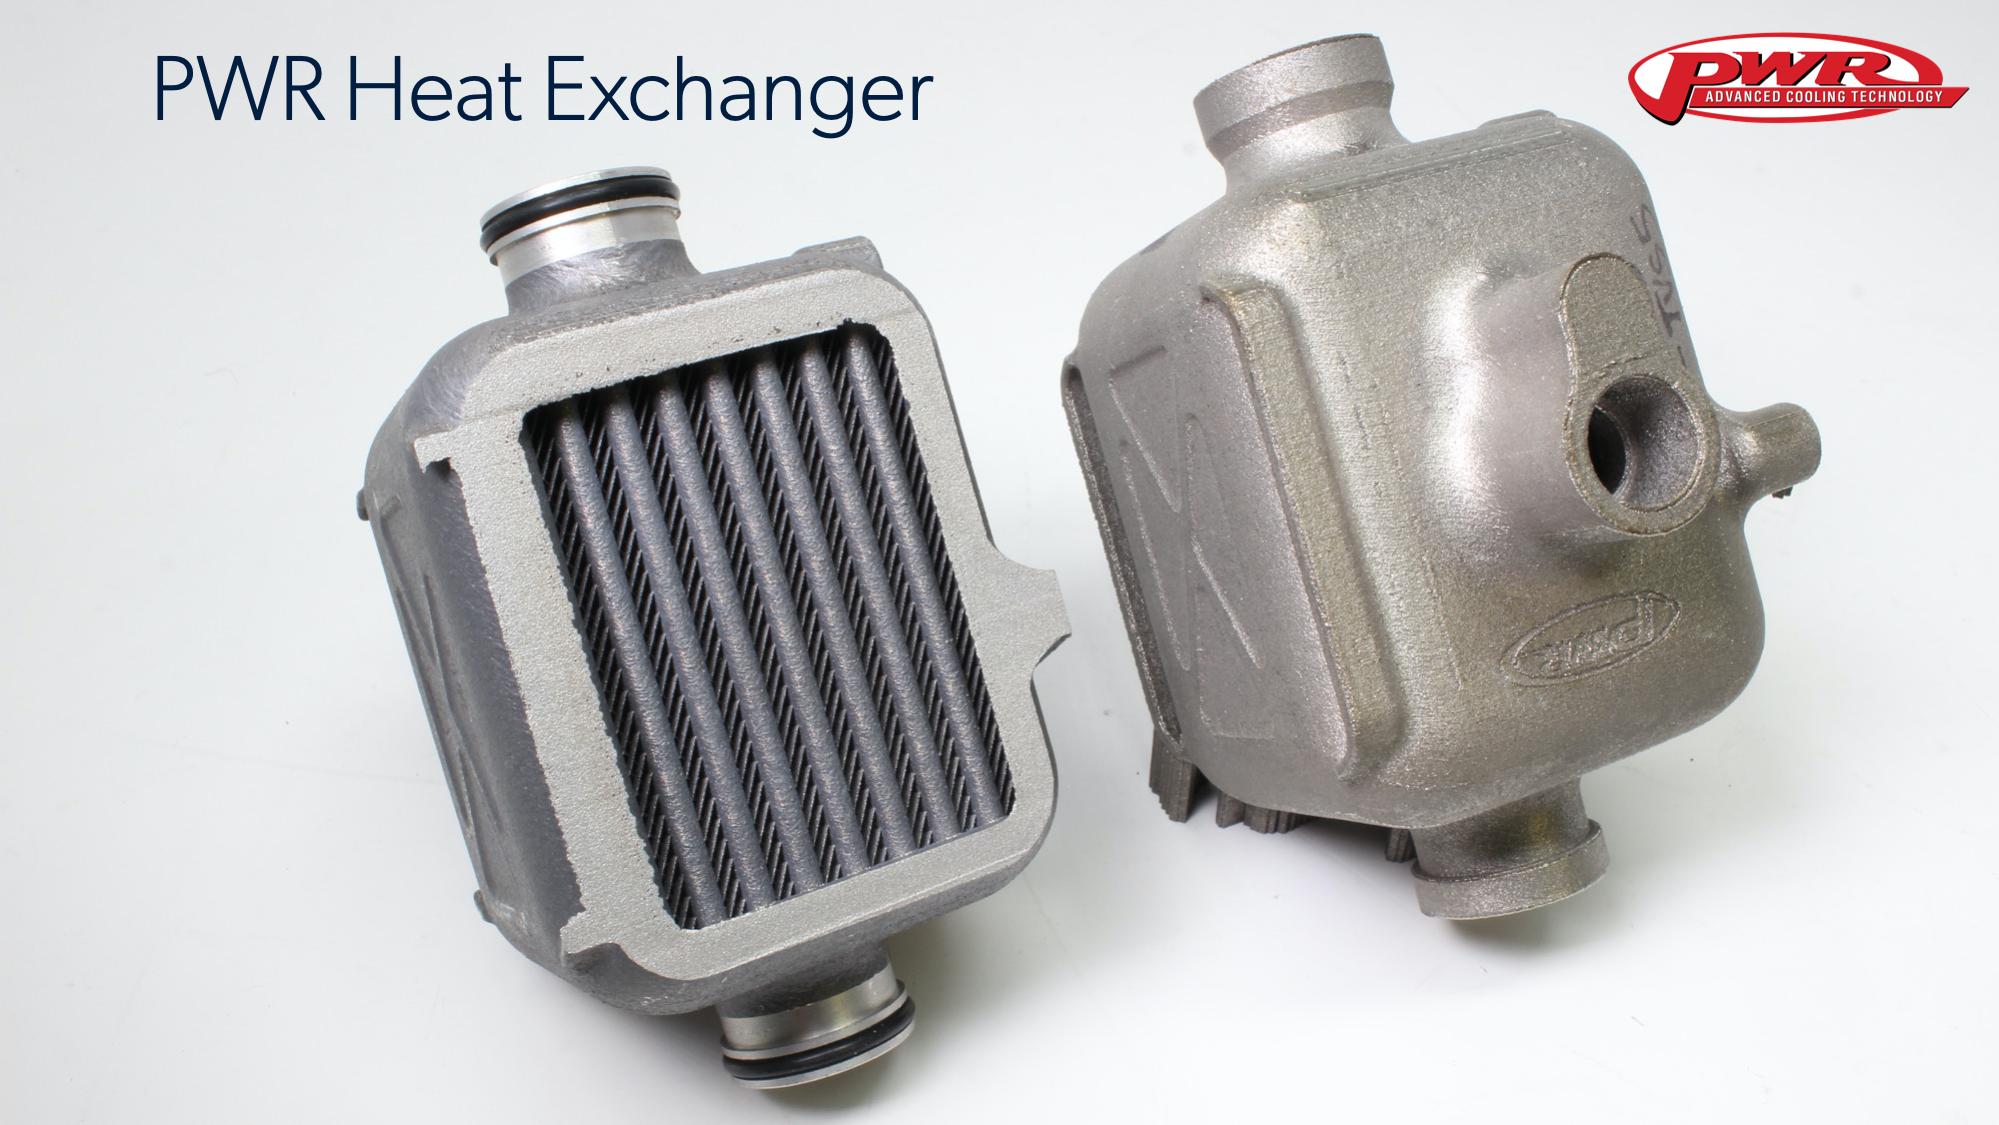 PWR Heat Exchanger